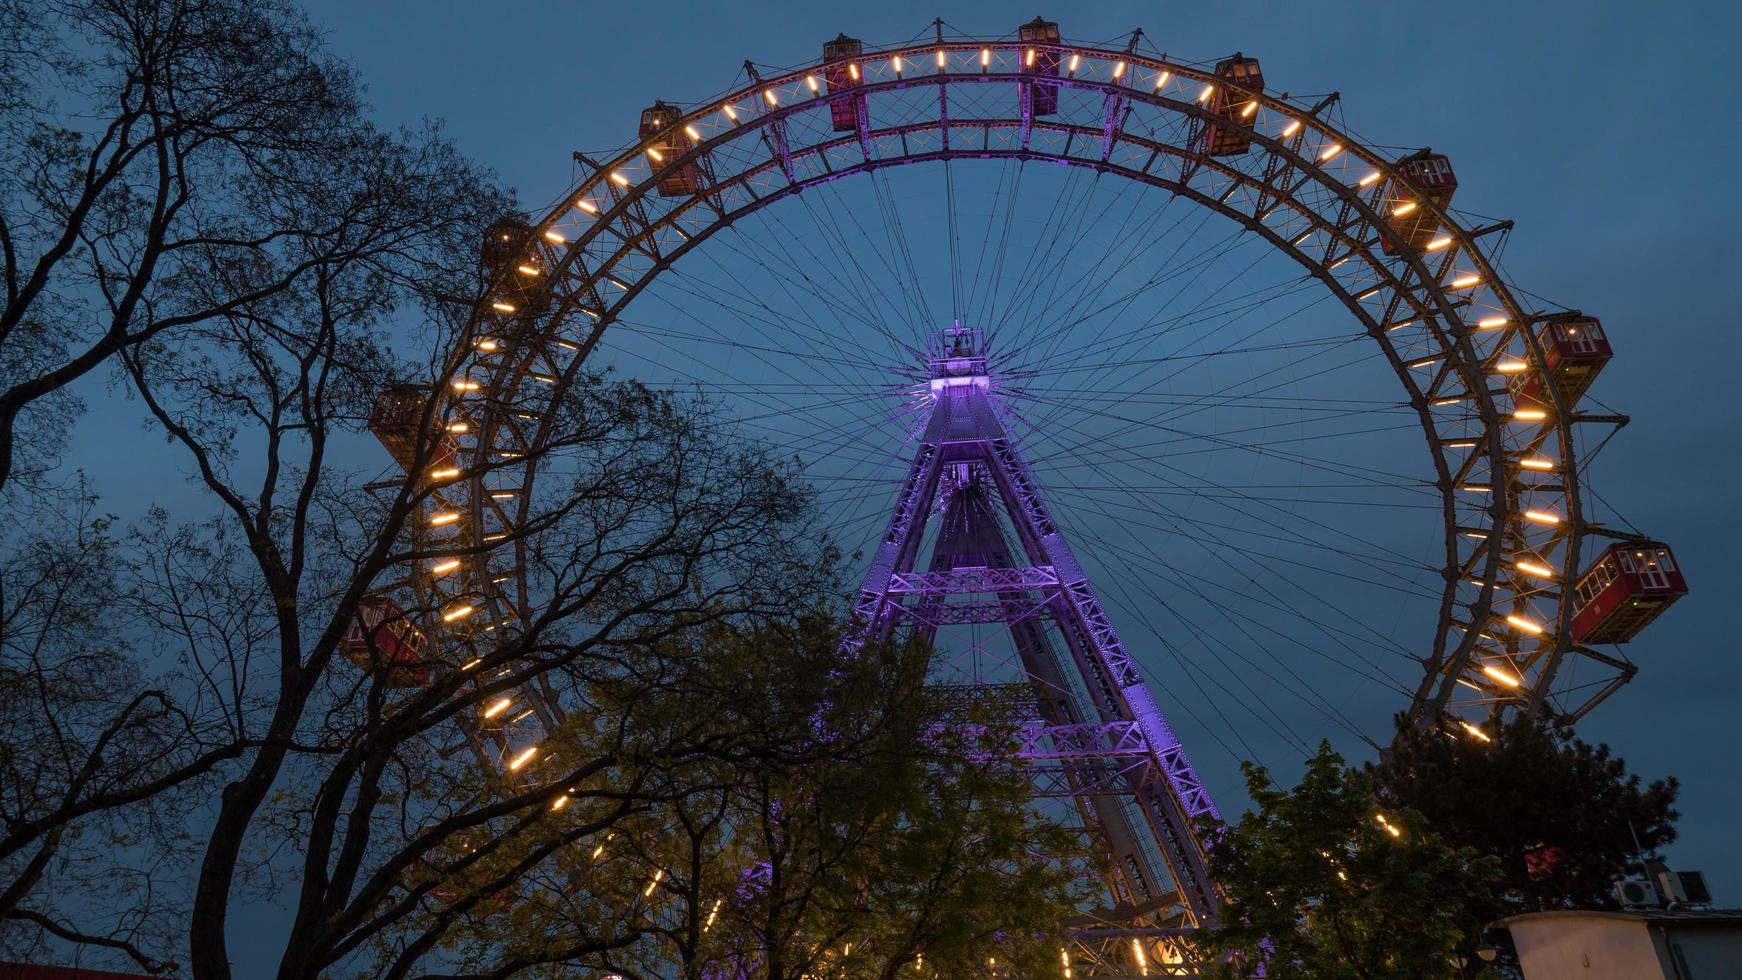 Vienna, Austria, 2020a - Giant Ferris wheel in the evening photo